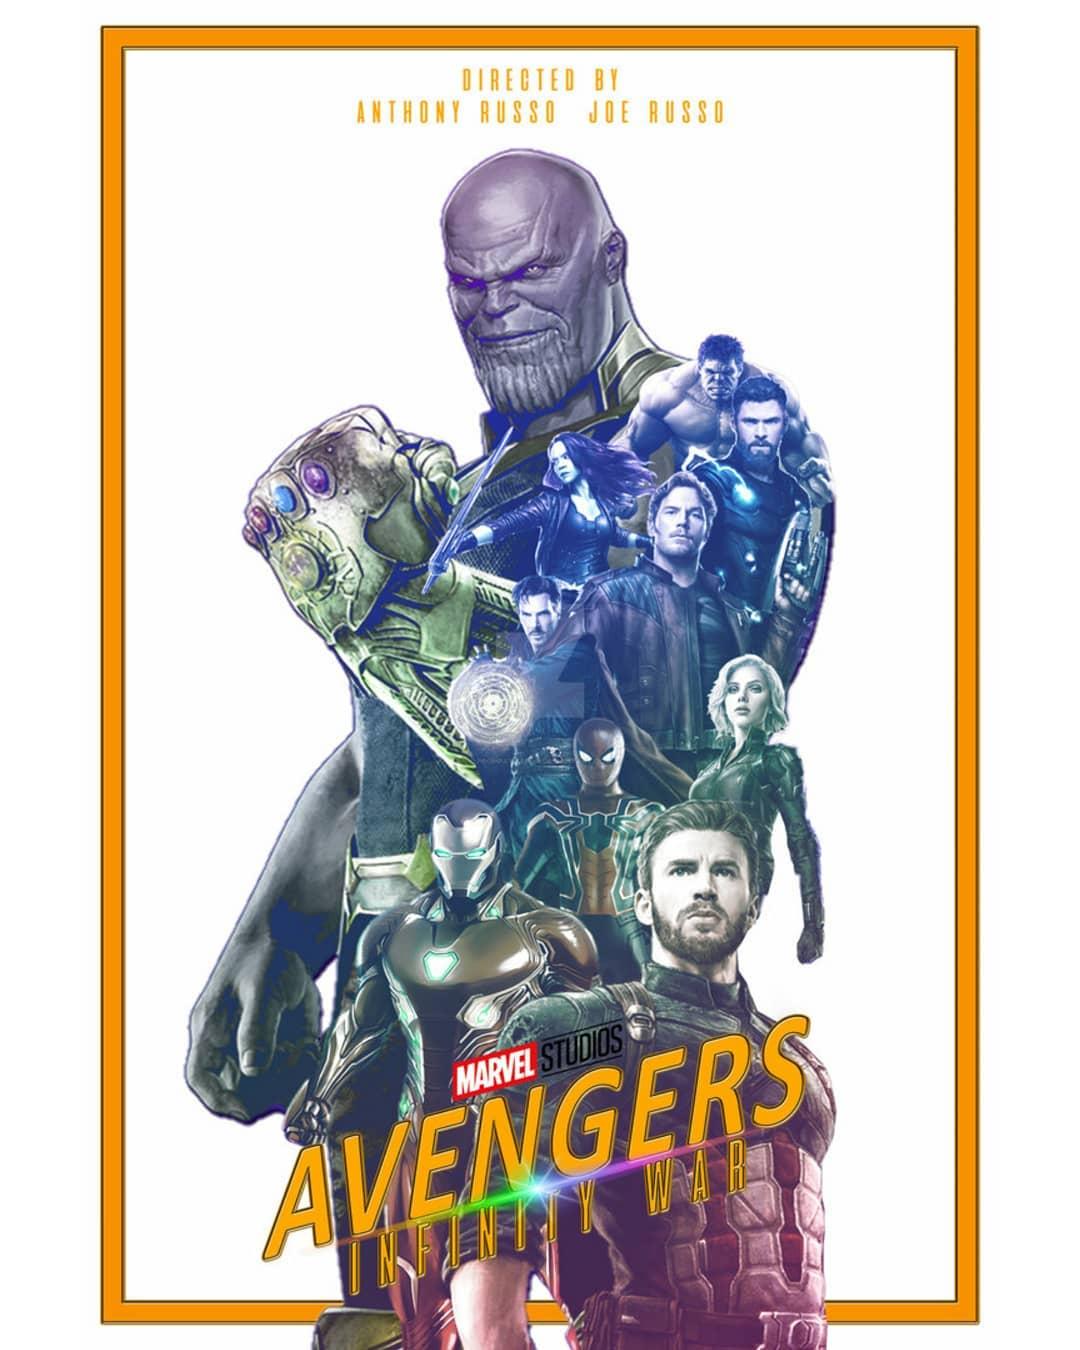 Avengers: Infinity War Poster Design